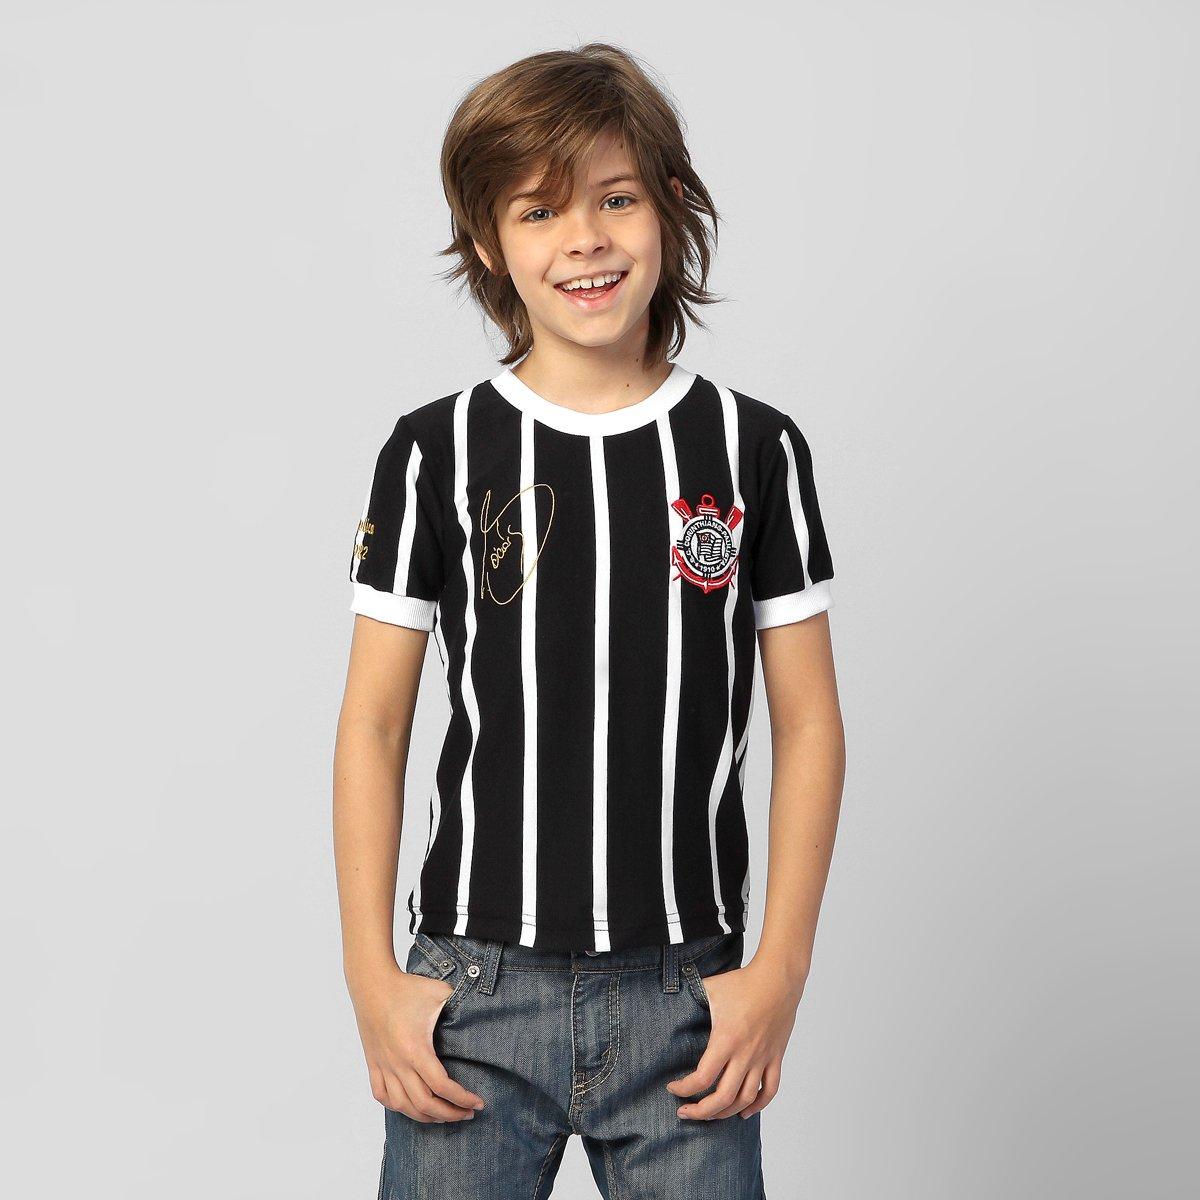 Camiseta Corinthians Sócrates Réplica Infantil - Compre Agora  a08a32aeb3f4d